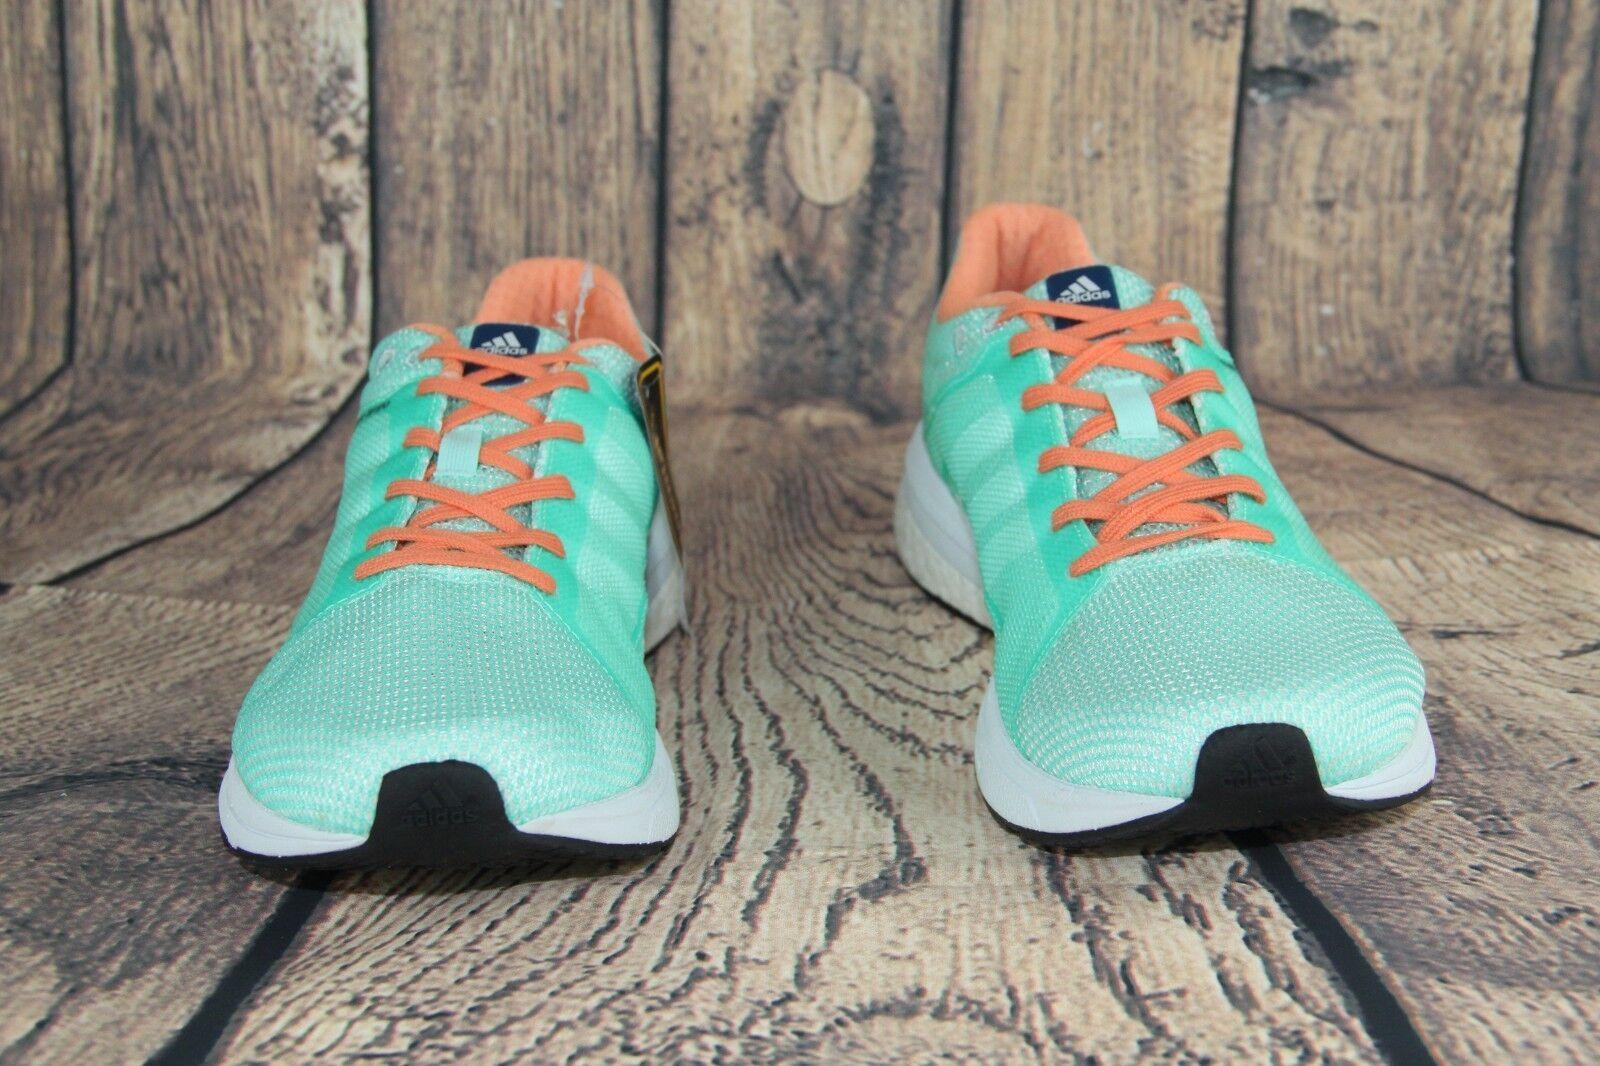 Adidas Adizero Tempo Boost Women's  Running Shoes Sneakers Green BA8095 WMNS SZ